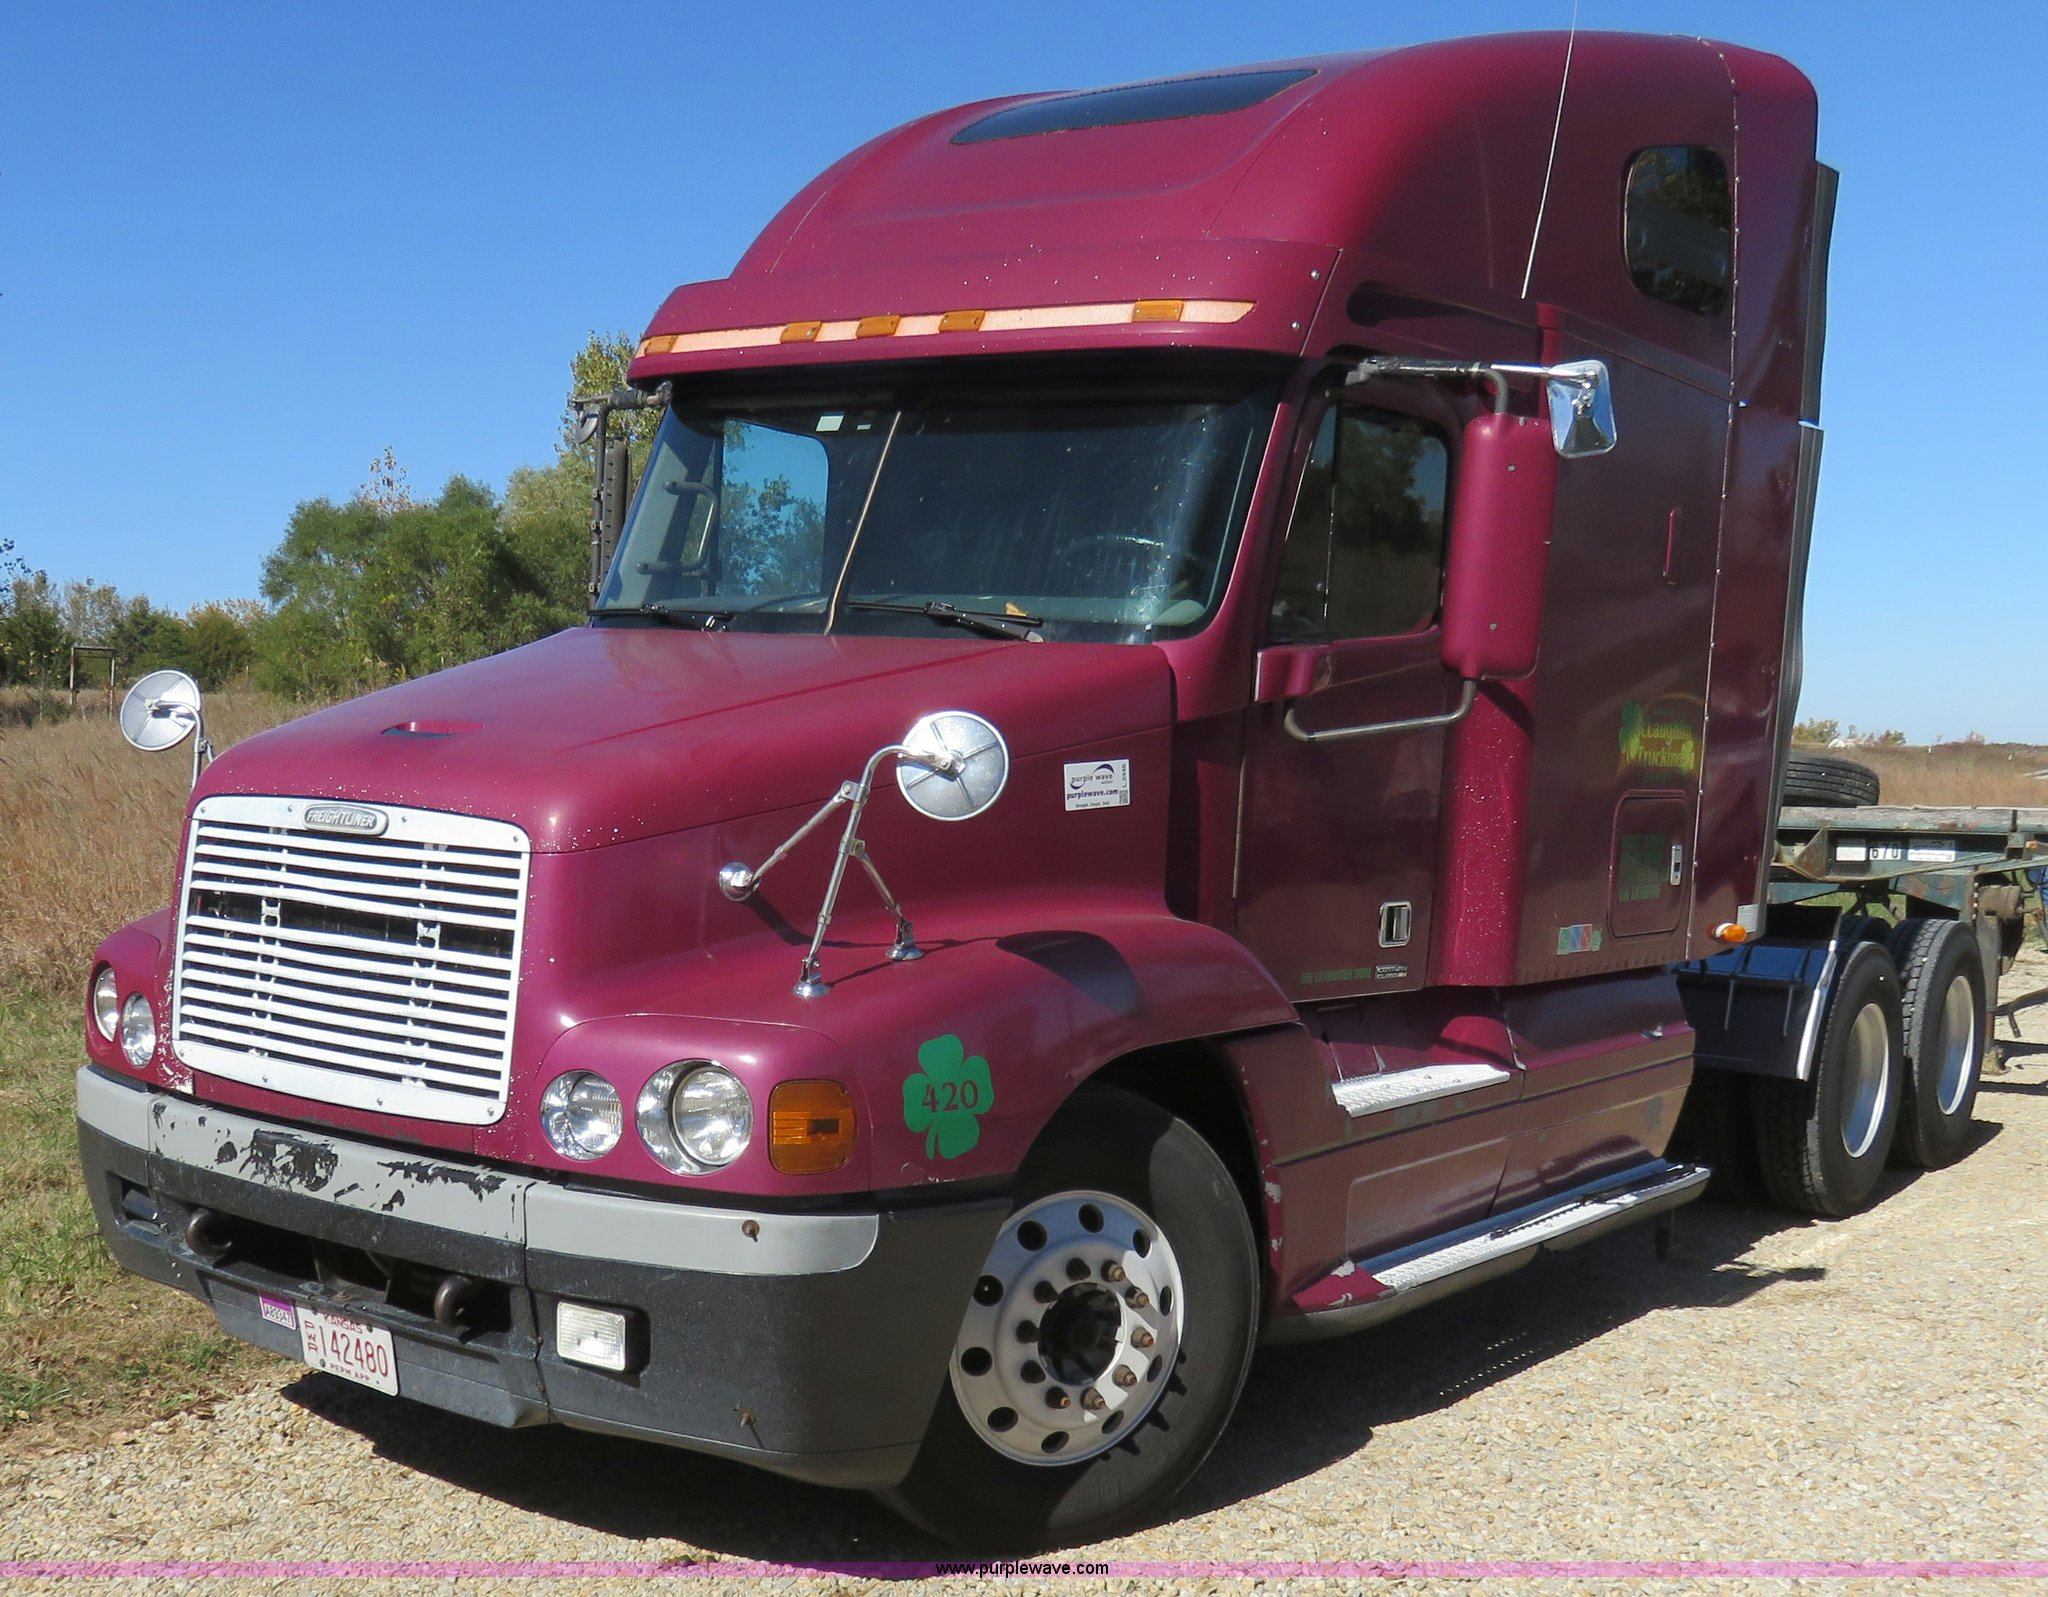 ... 1999 Freightliner Century Class semi truck Full size in new window ...